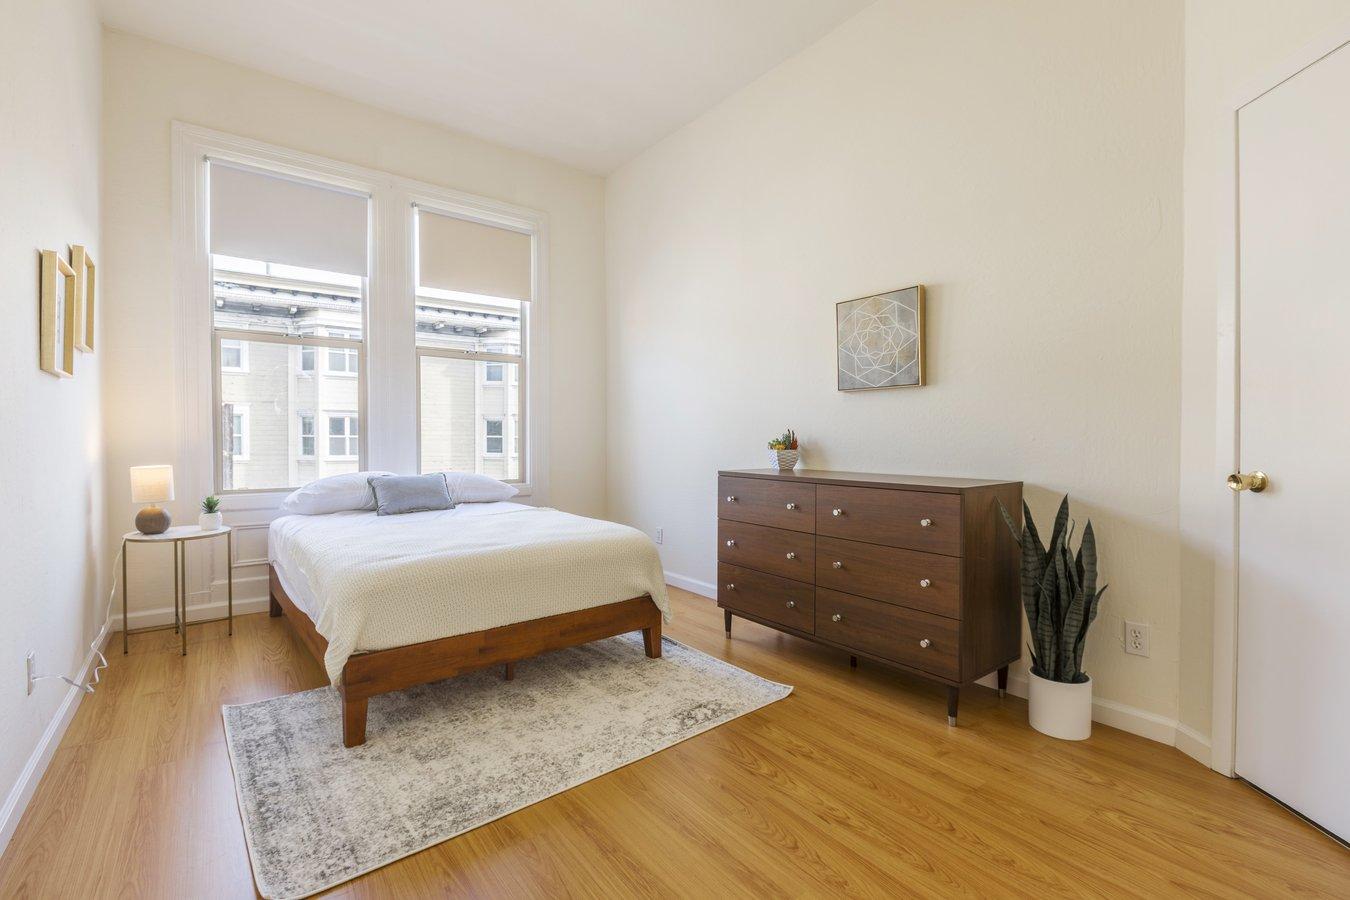 1 Bedroom 1 Bathroom House for rent at Oak St & Fillmore St Coliving in San Francisco, CA